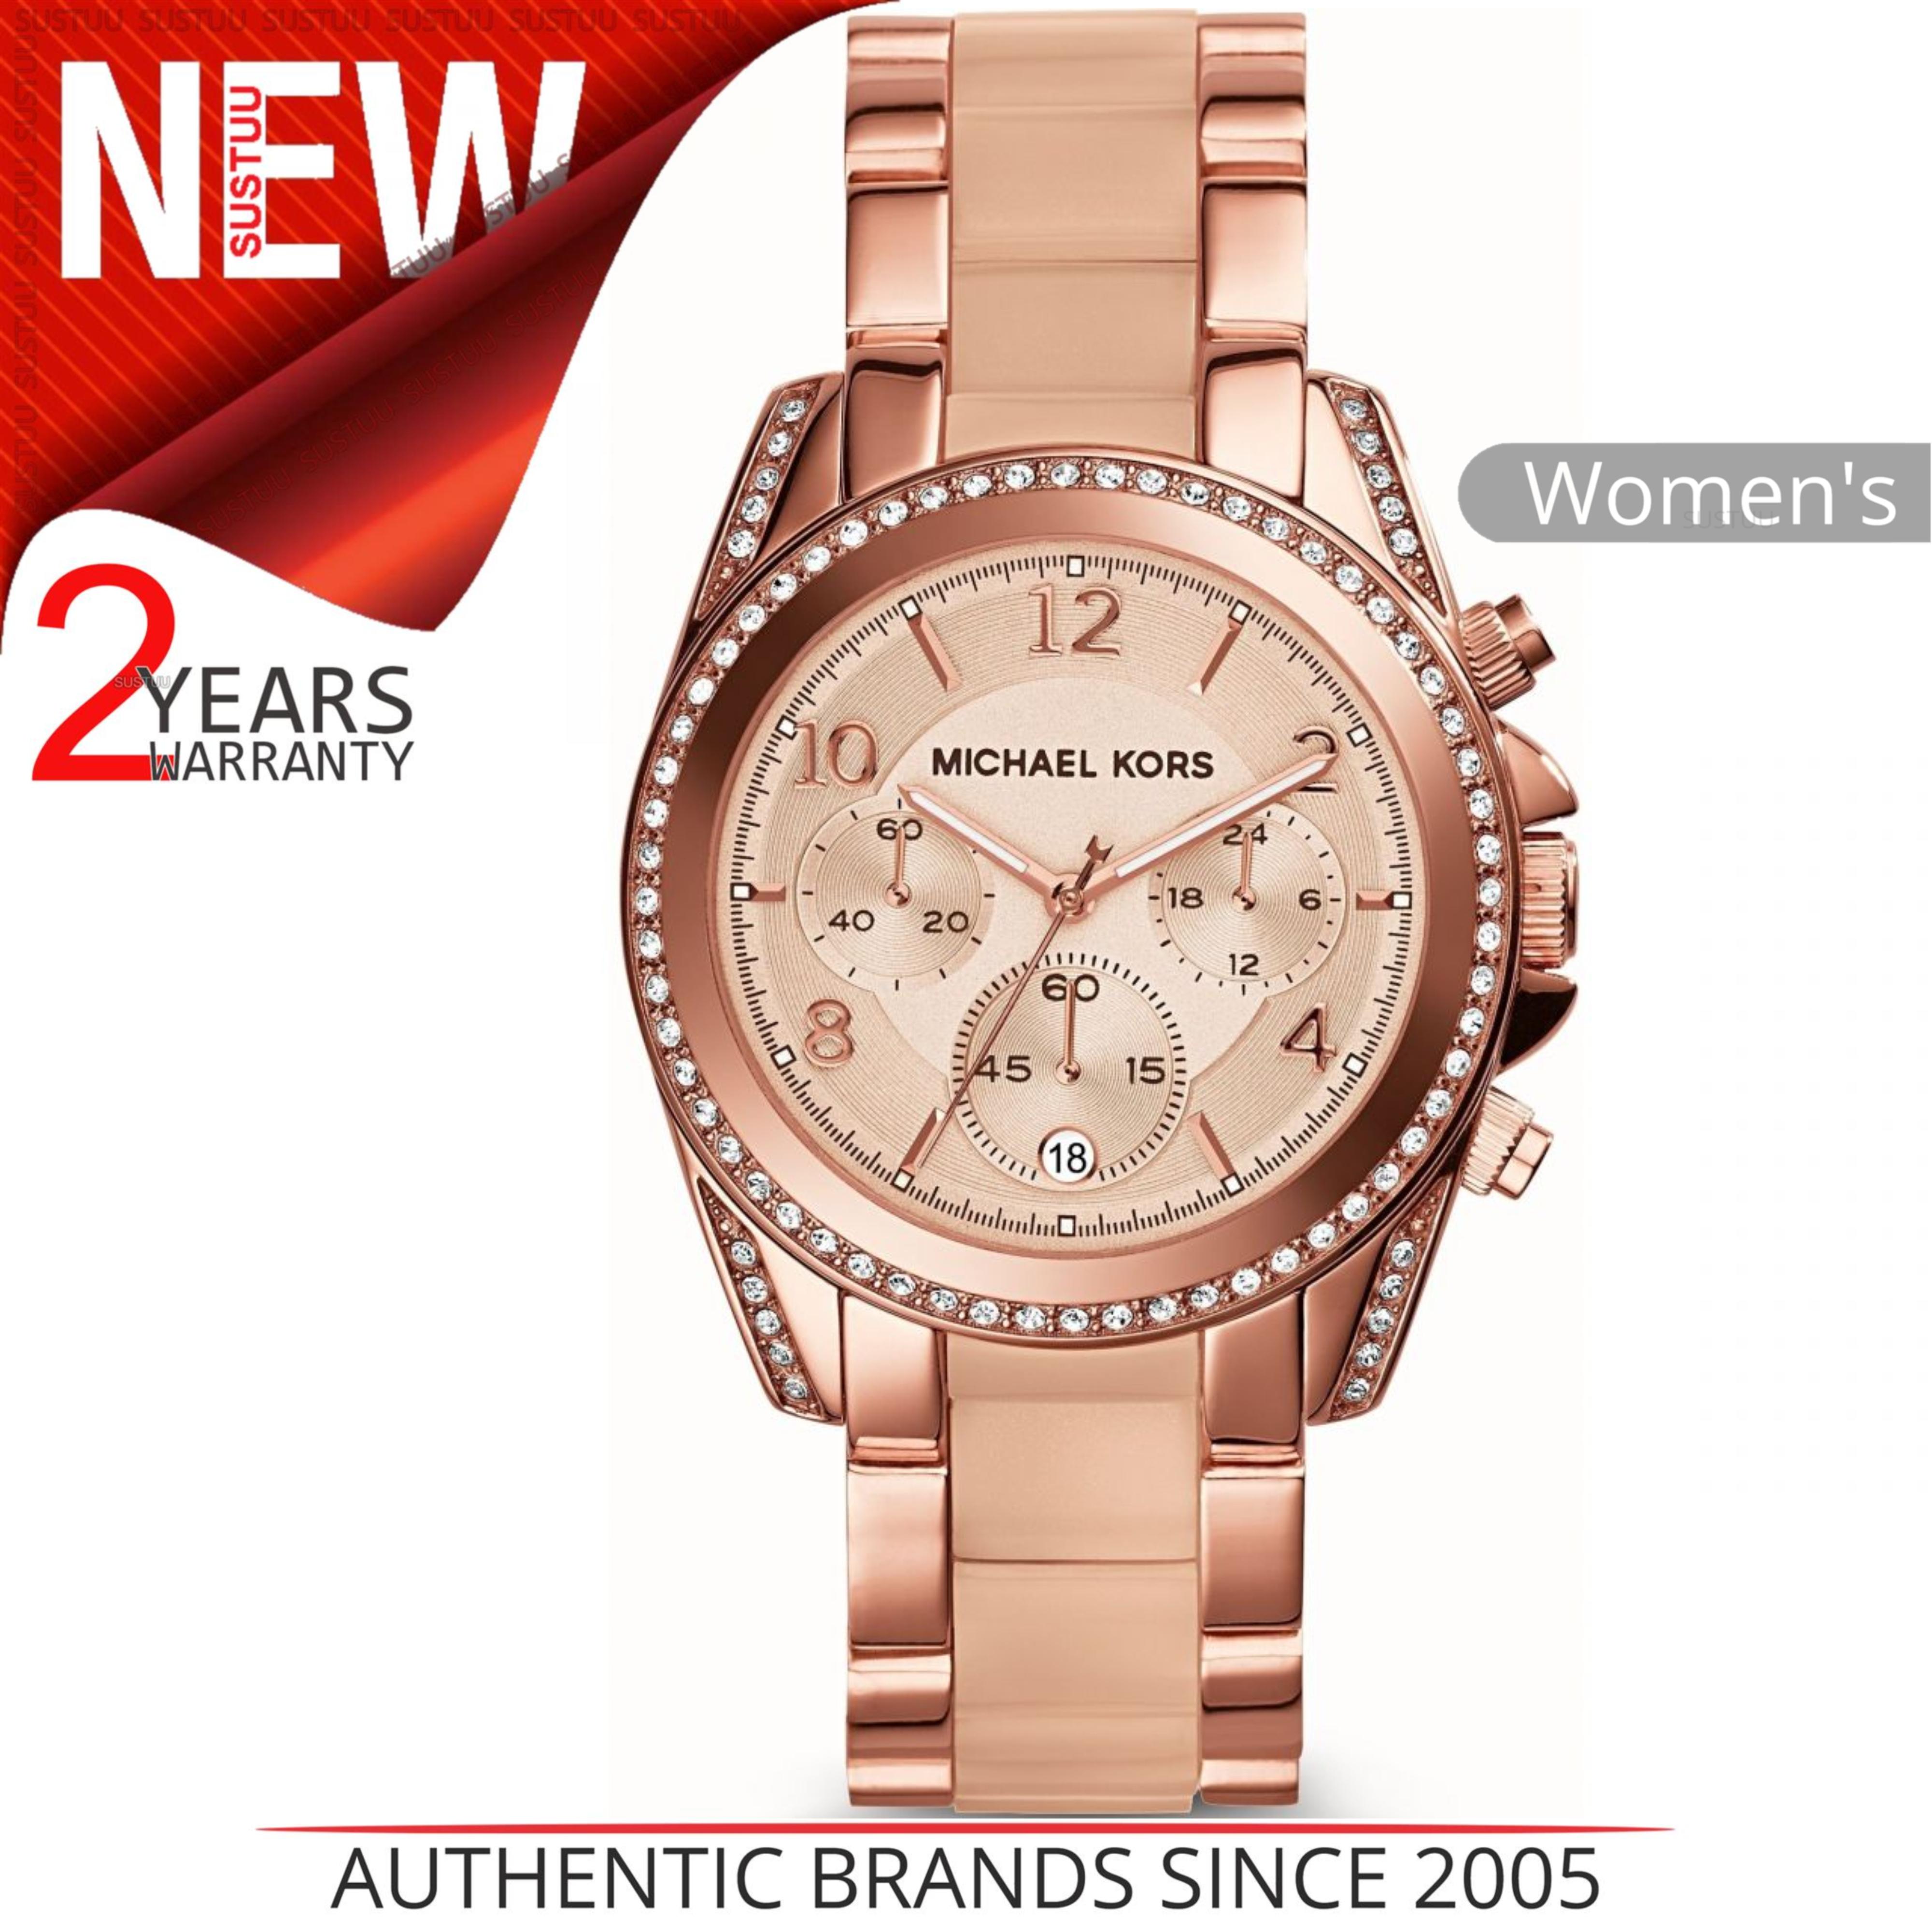 d9edf1b96e3a8 Sentinel Michael Kors Blair Ladies  Watch│Chrono Dial│Rose Gold   Acetate  Bracelet│